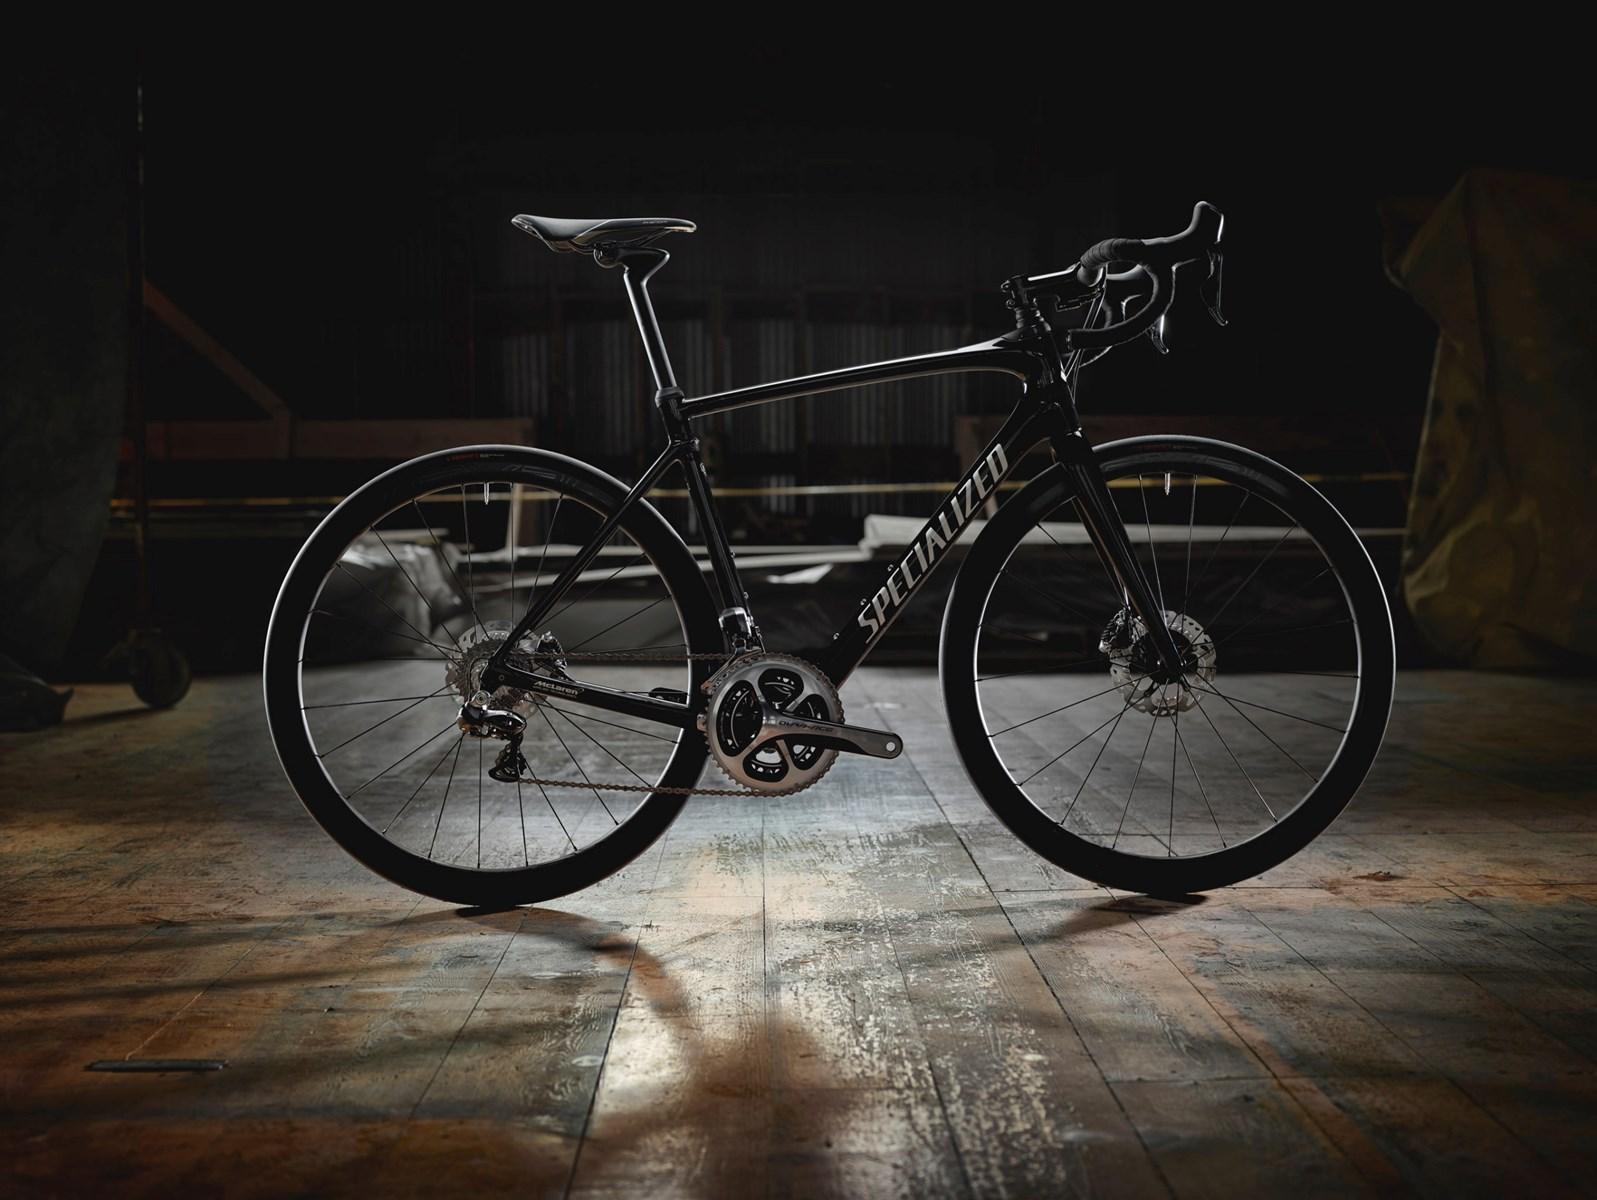 specialized roubaix expert udi2 road bike 2017 black